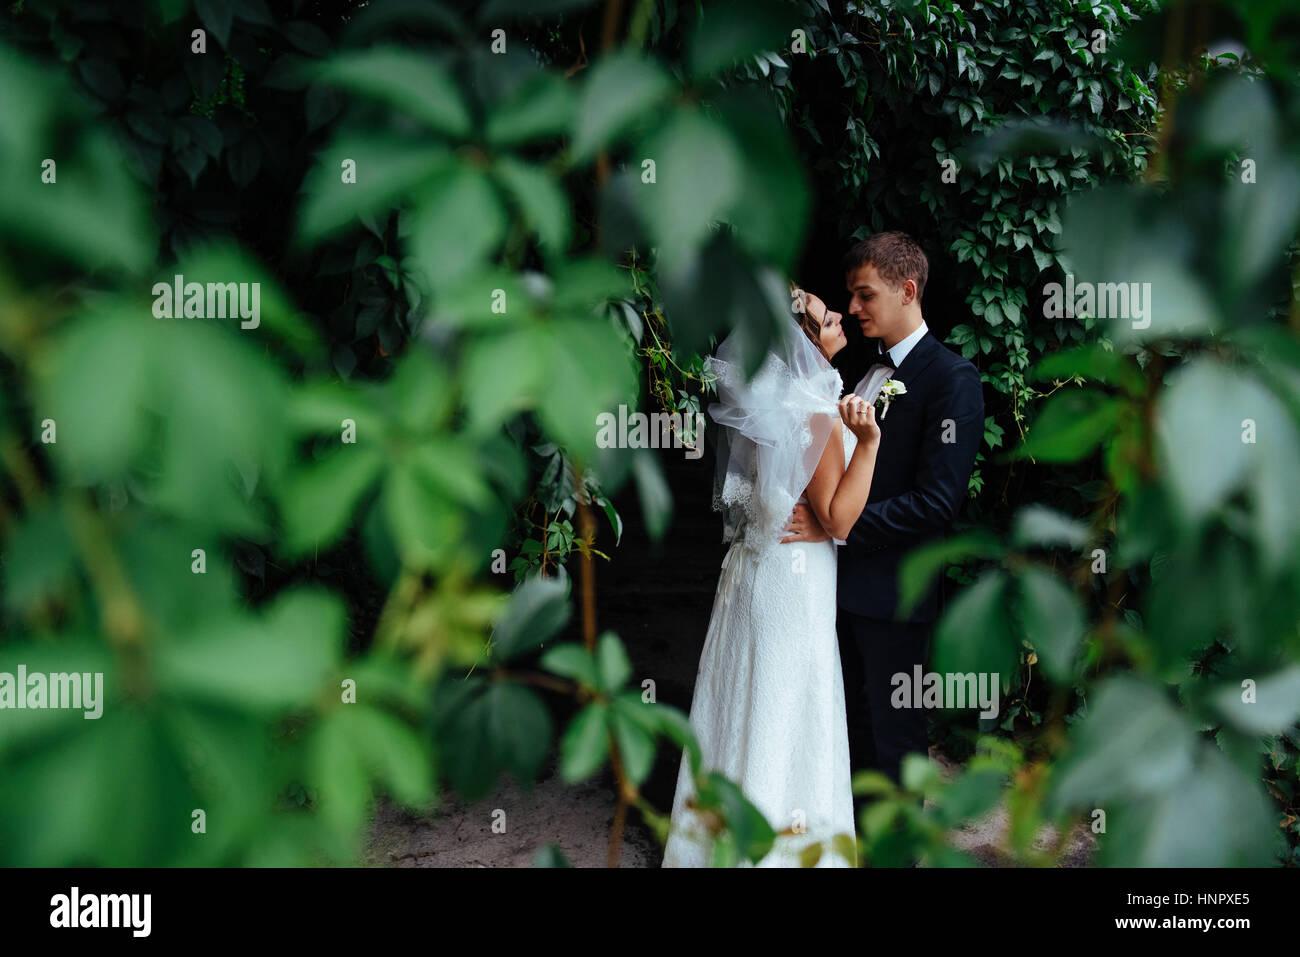 Beau jeune couple de mariage , blonde bride avec rose ... Photo Stock